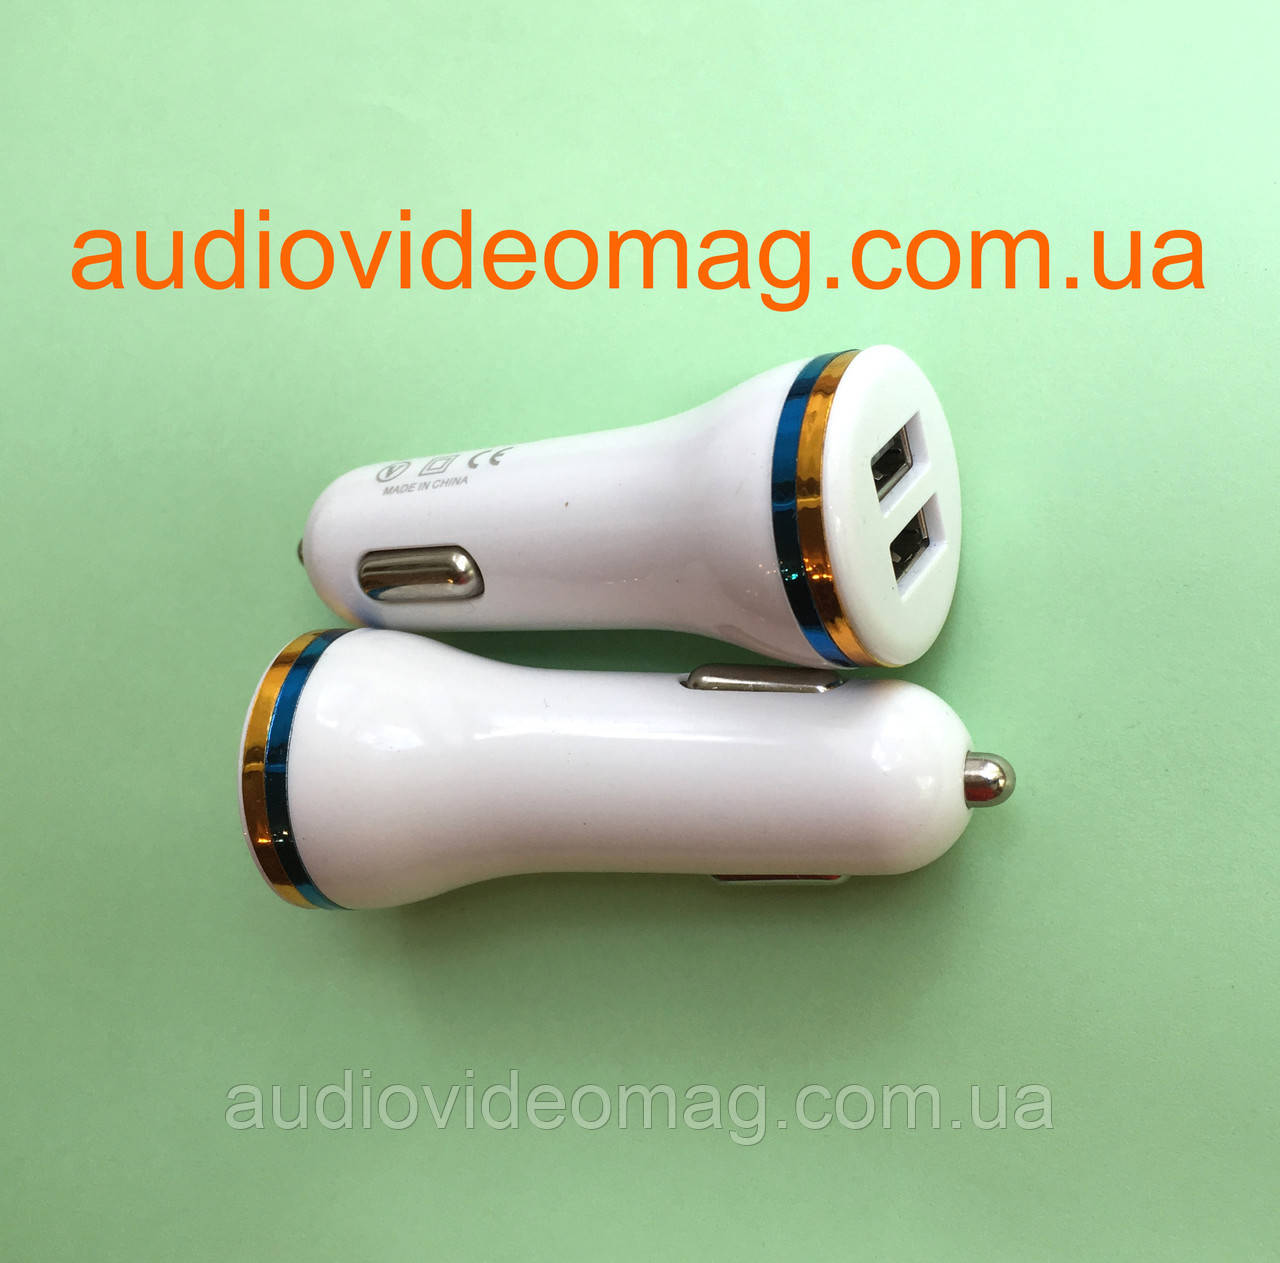 Автомобильный адаптер питания USB 5V 1A два гнезда